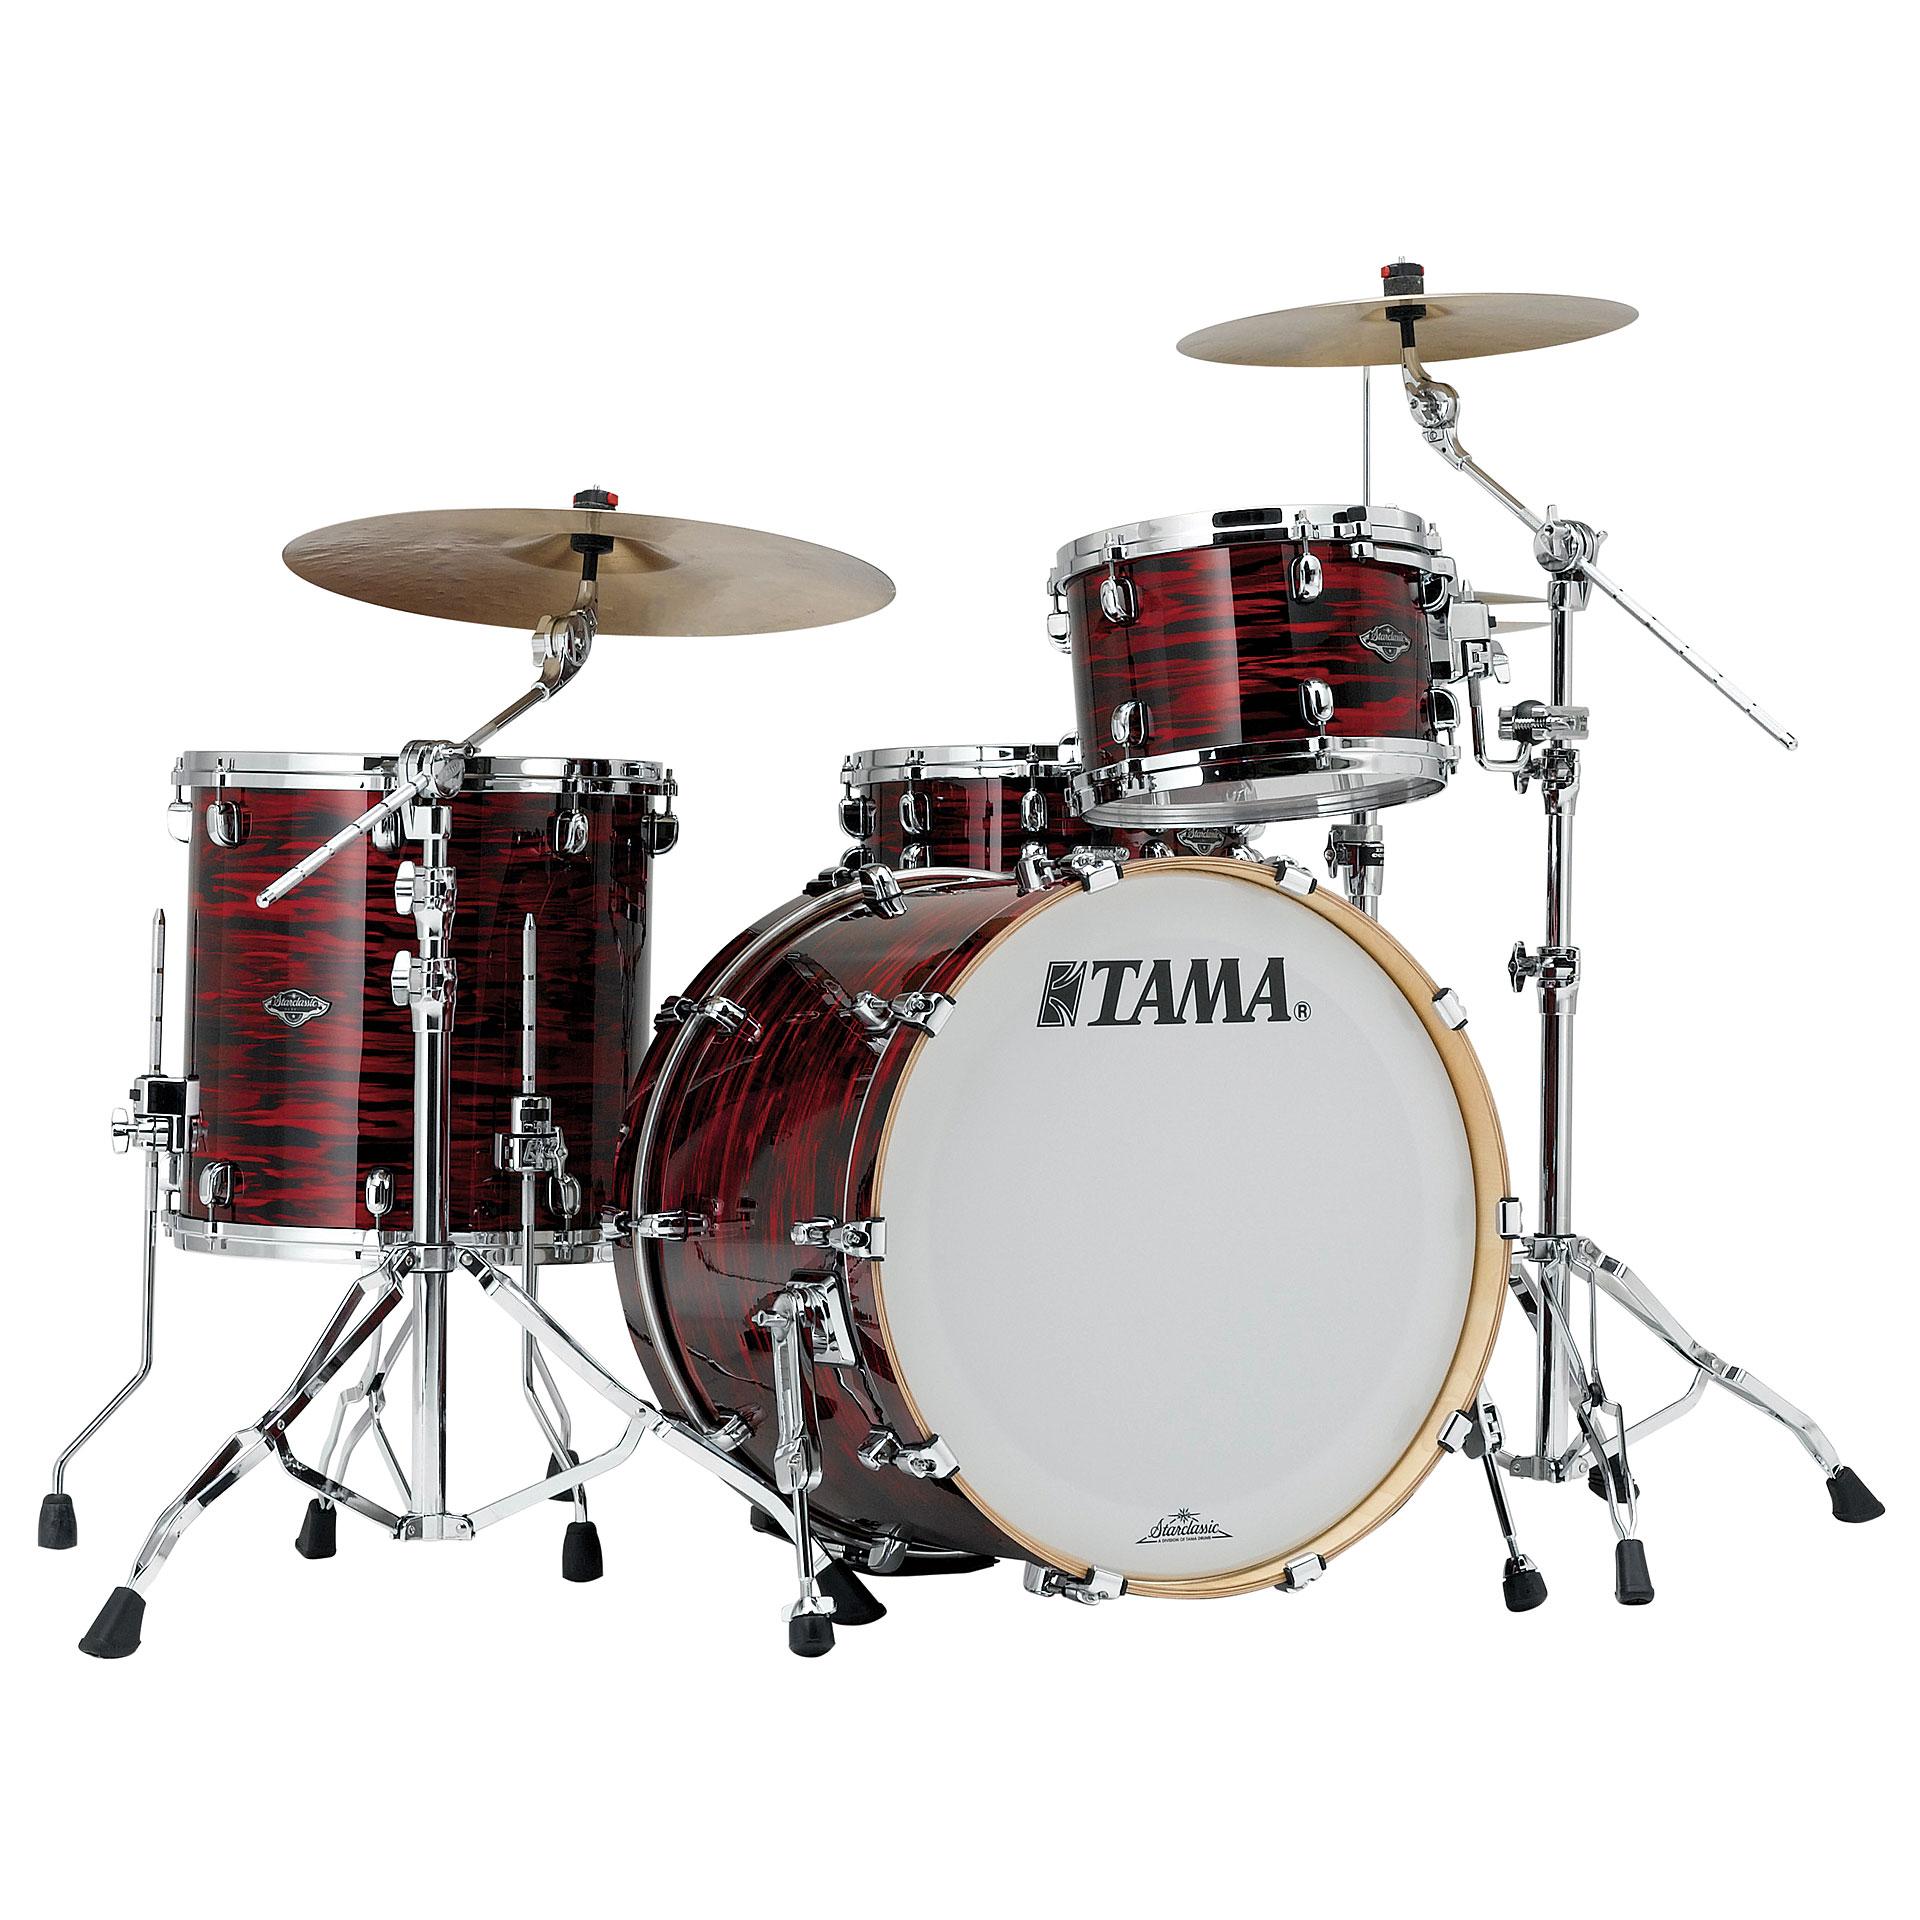 tama starclassic performer efx pr32rzs roy drum kit. Black Bedroom Furniture Sets. Home Design Ideas